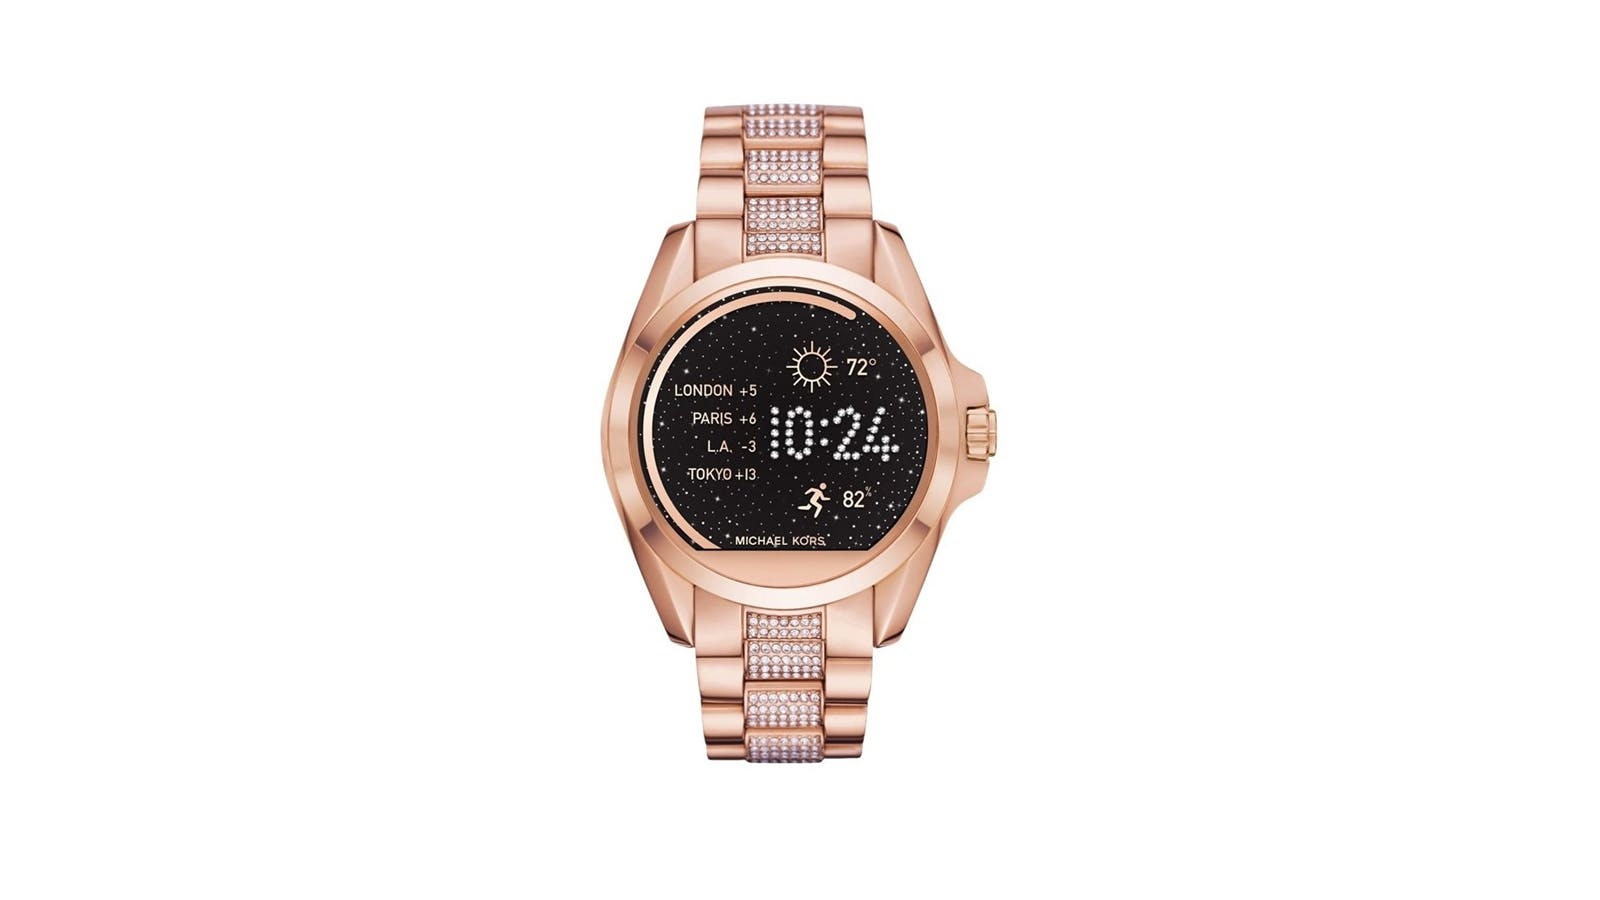 cce9b46dc947 Michael Kors 44MM Bradshaw Rose Gold-Tone Smartwatch